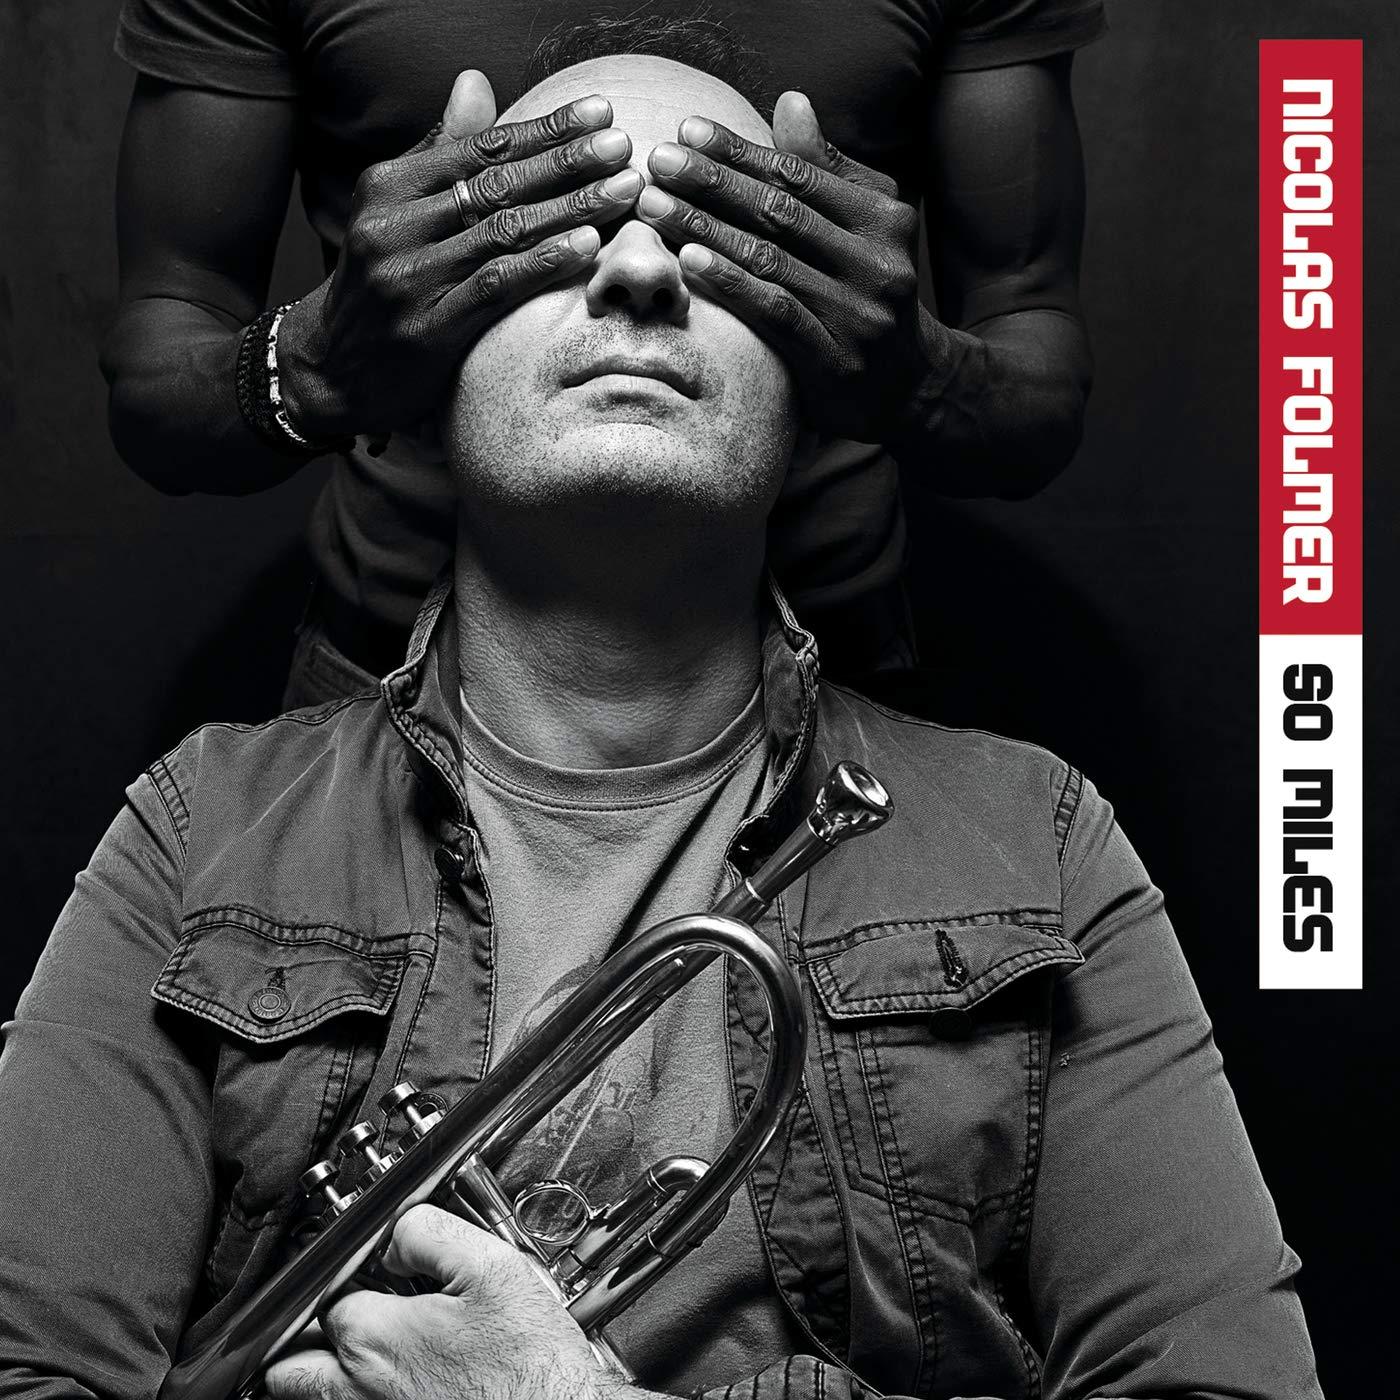 NICOLAS FOLMER - So Miles cover